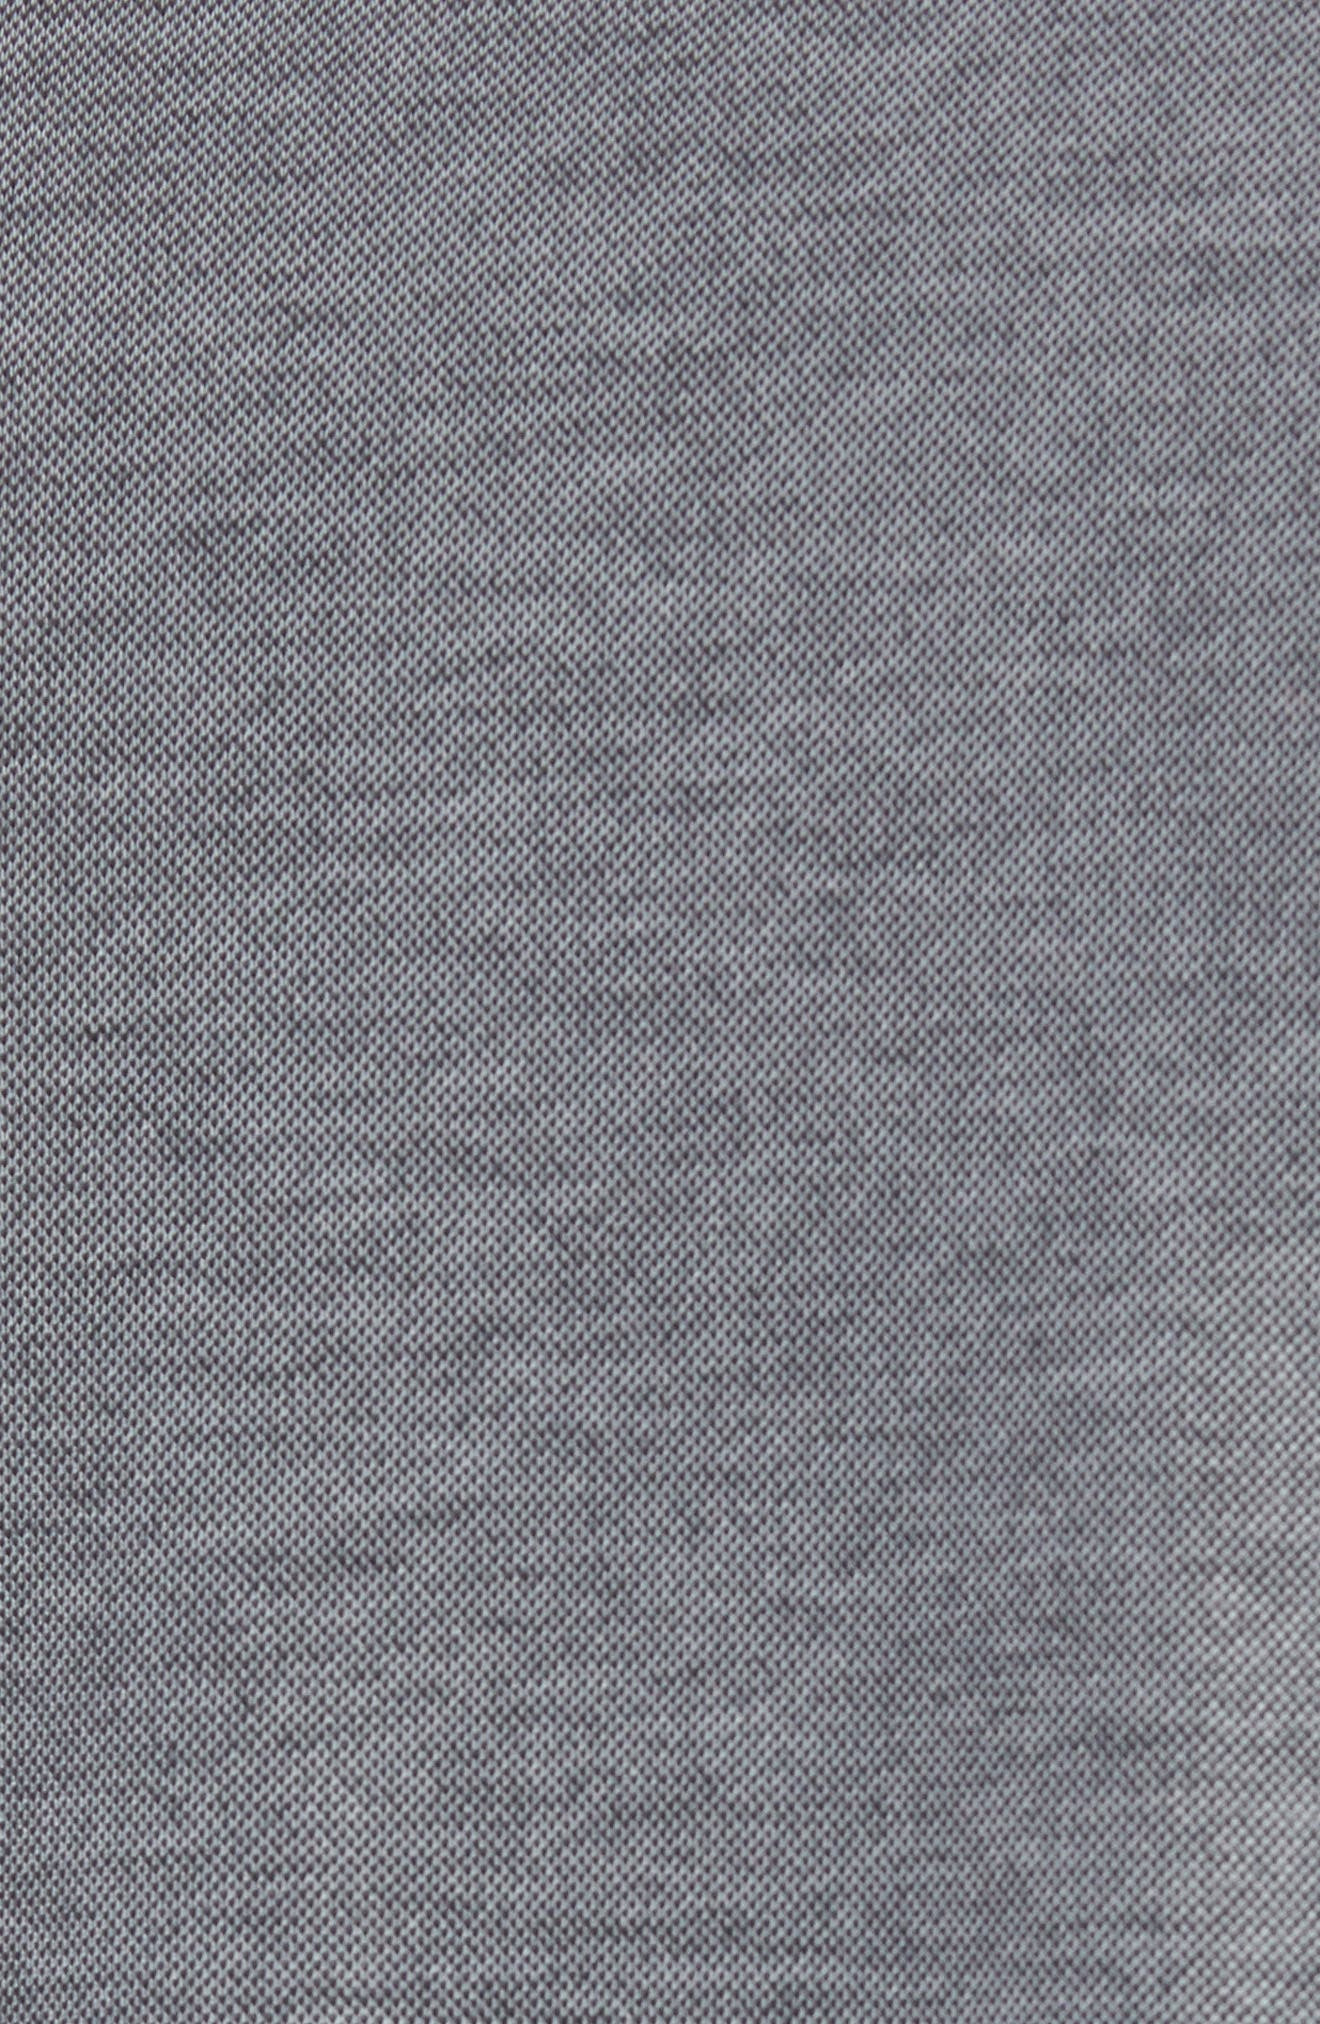 Kay Regular Fit Long Sleeve Polo Shirt,                             Alternate thumbnail 5, color,                             HEATHER CASTLEROCK